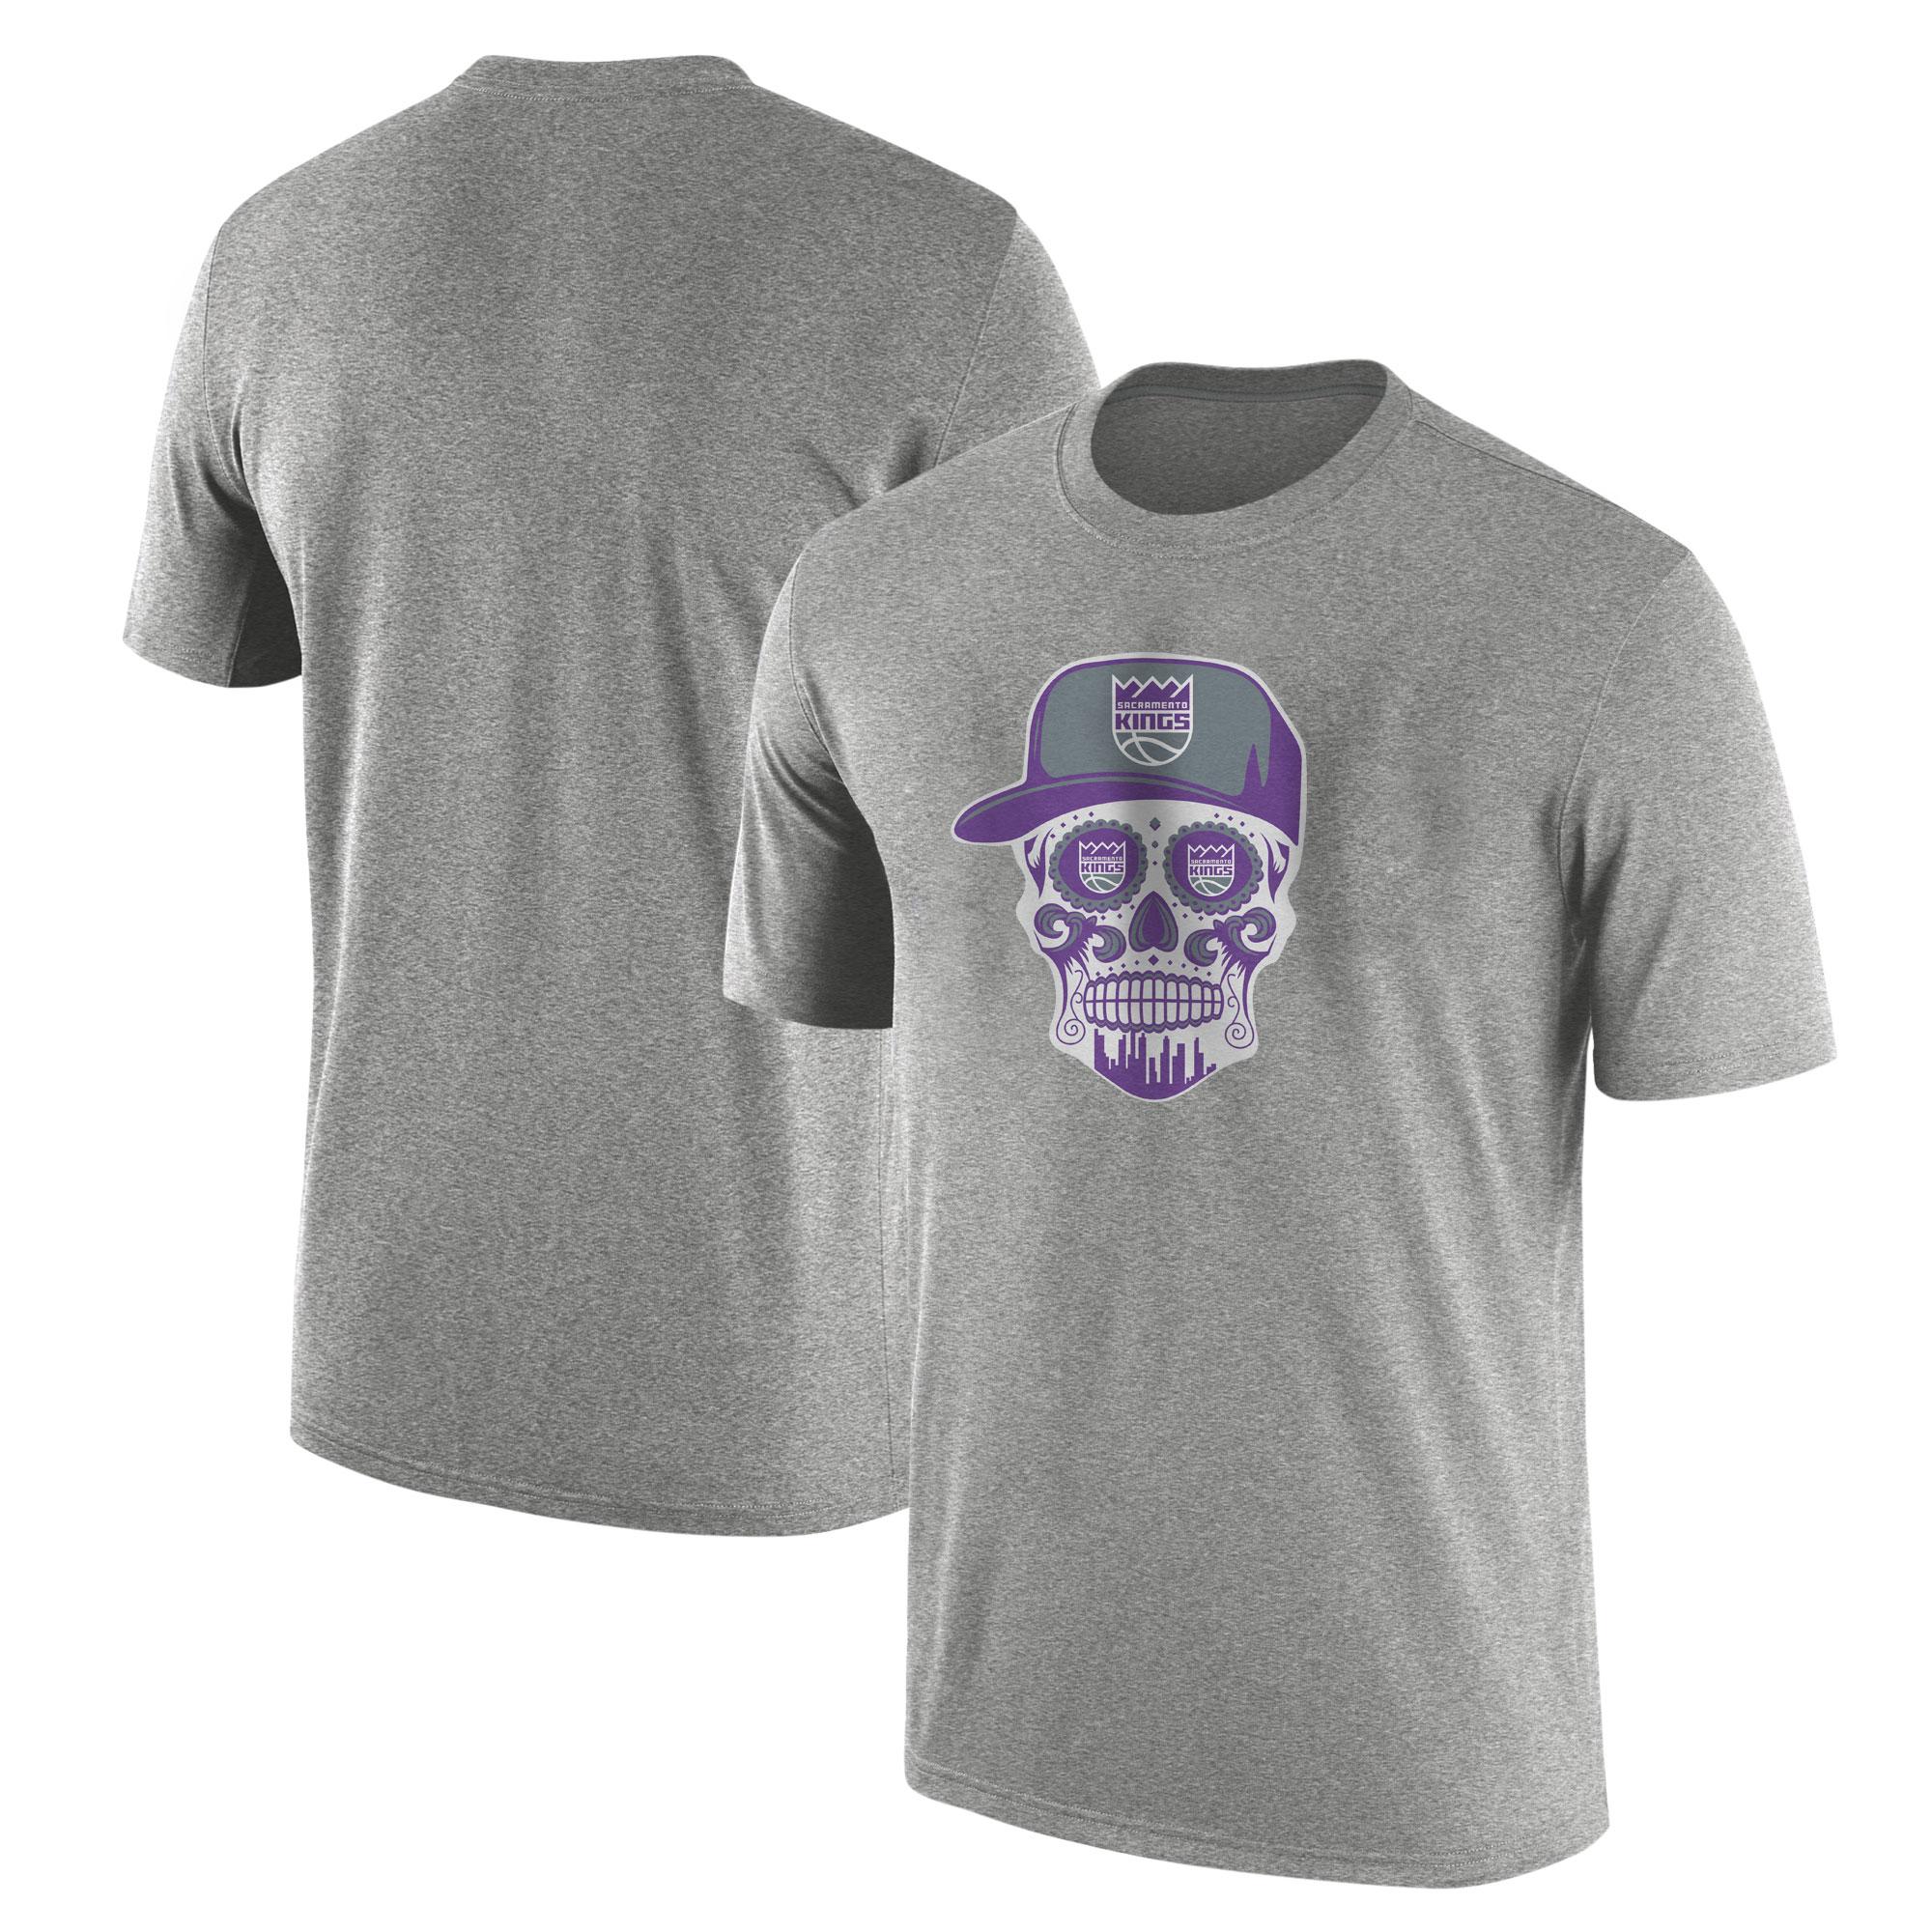 Sacramento Kings Sacramento Skull Tshirt (TSH-GRY-463-SACRAMENTO-SKULL)